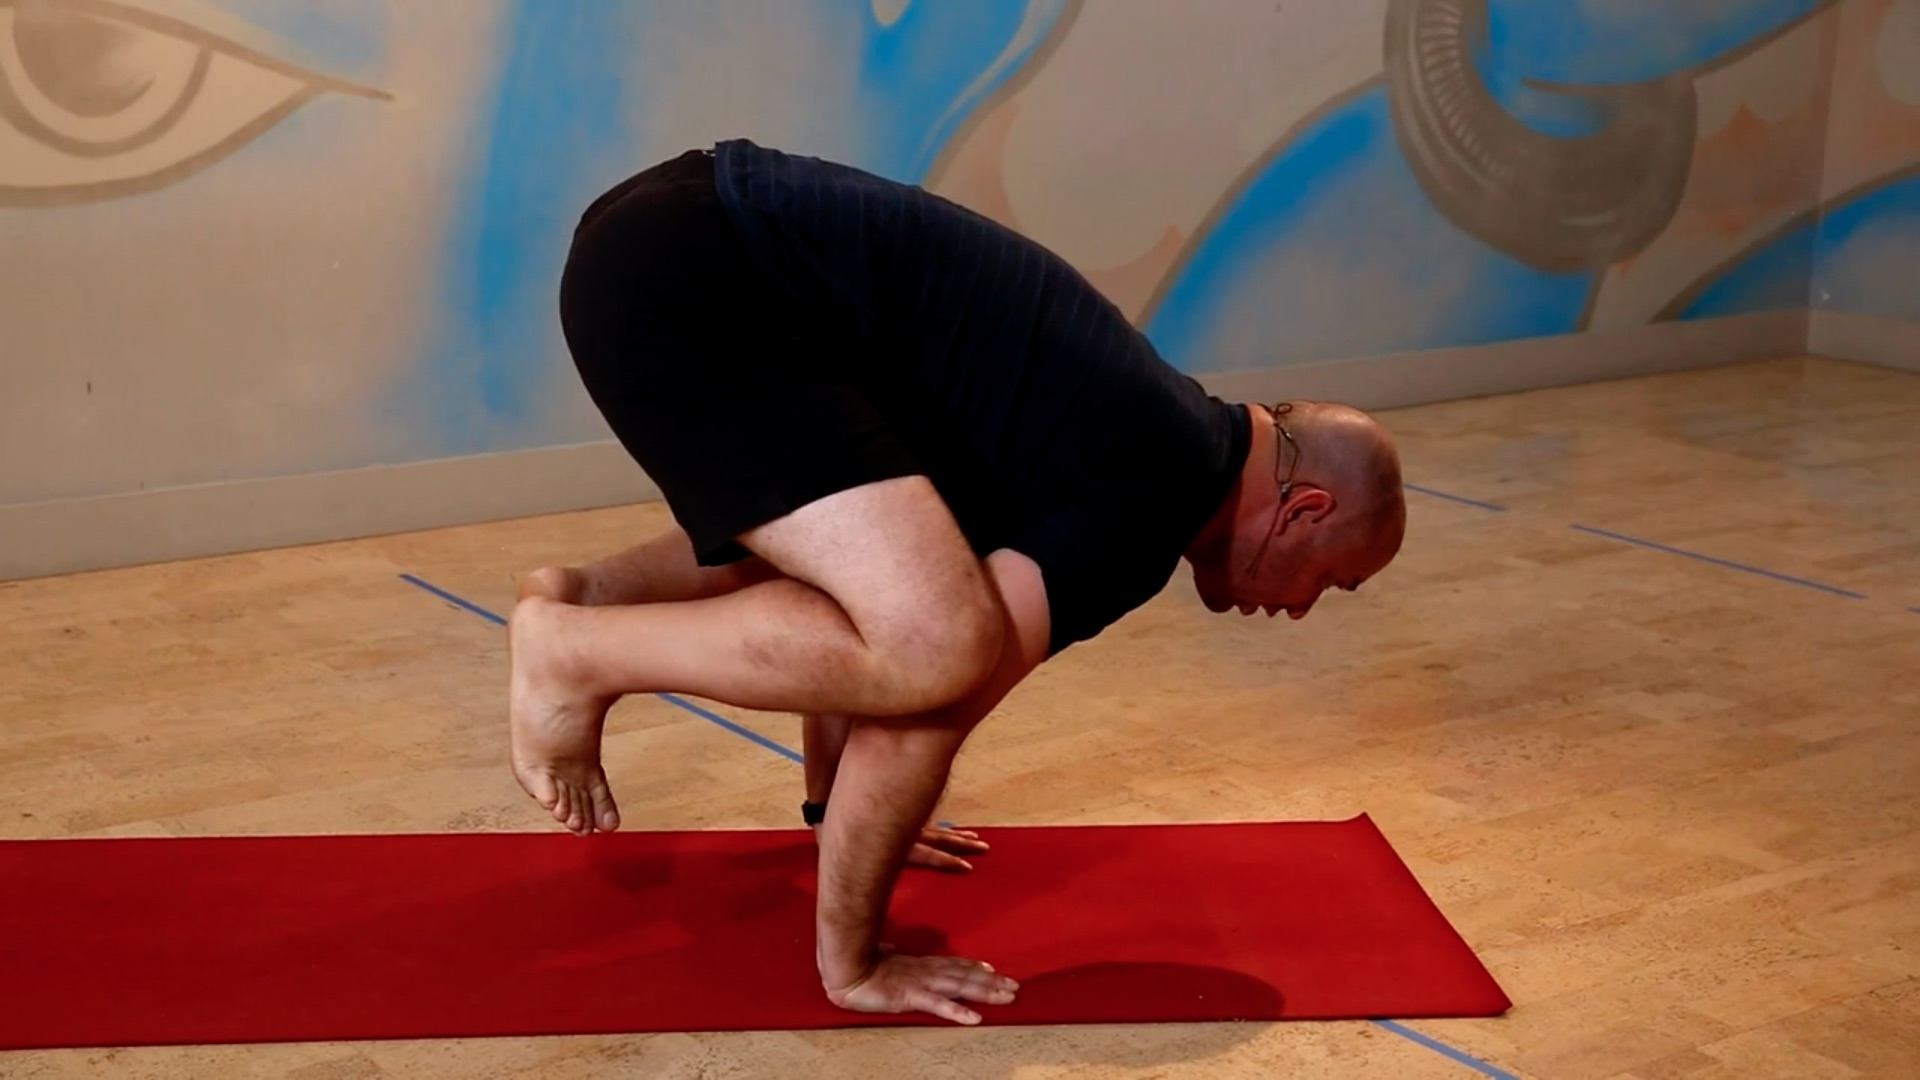 Crow sol ulbrich yogaholics power living australia yoga online yoga